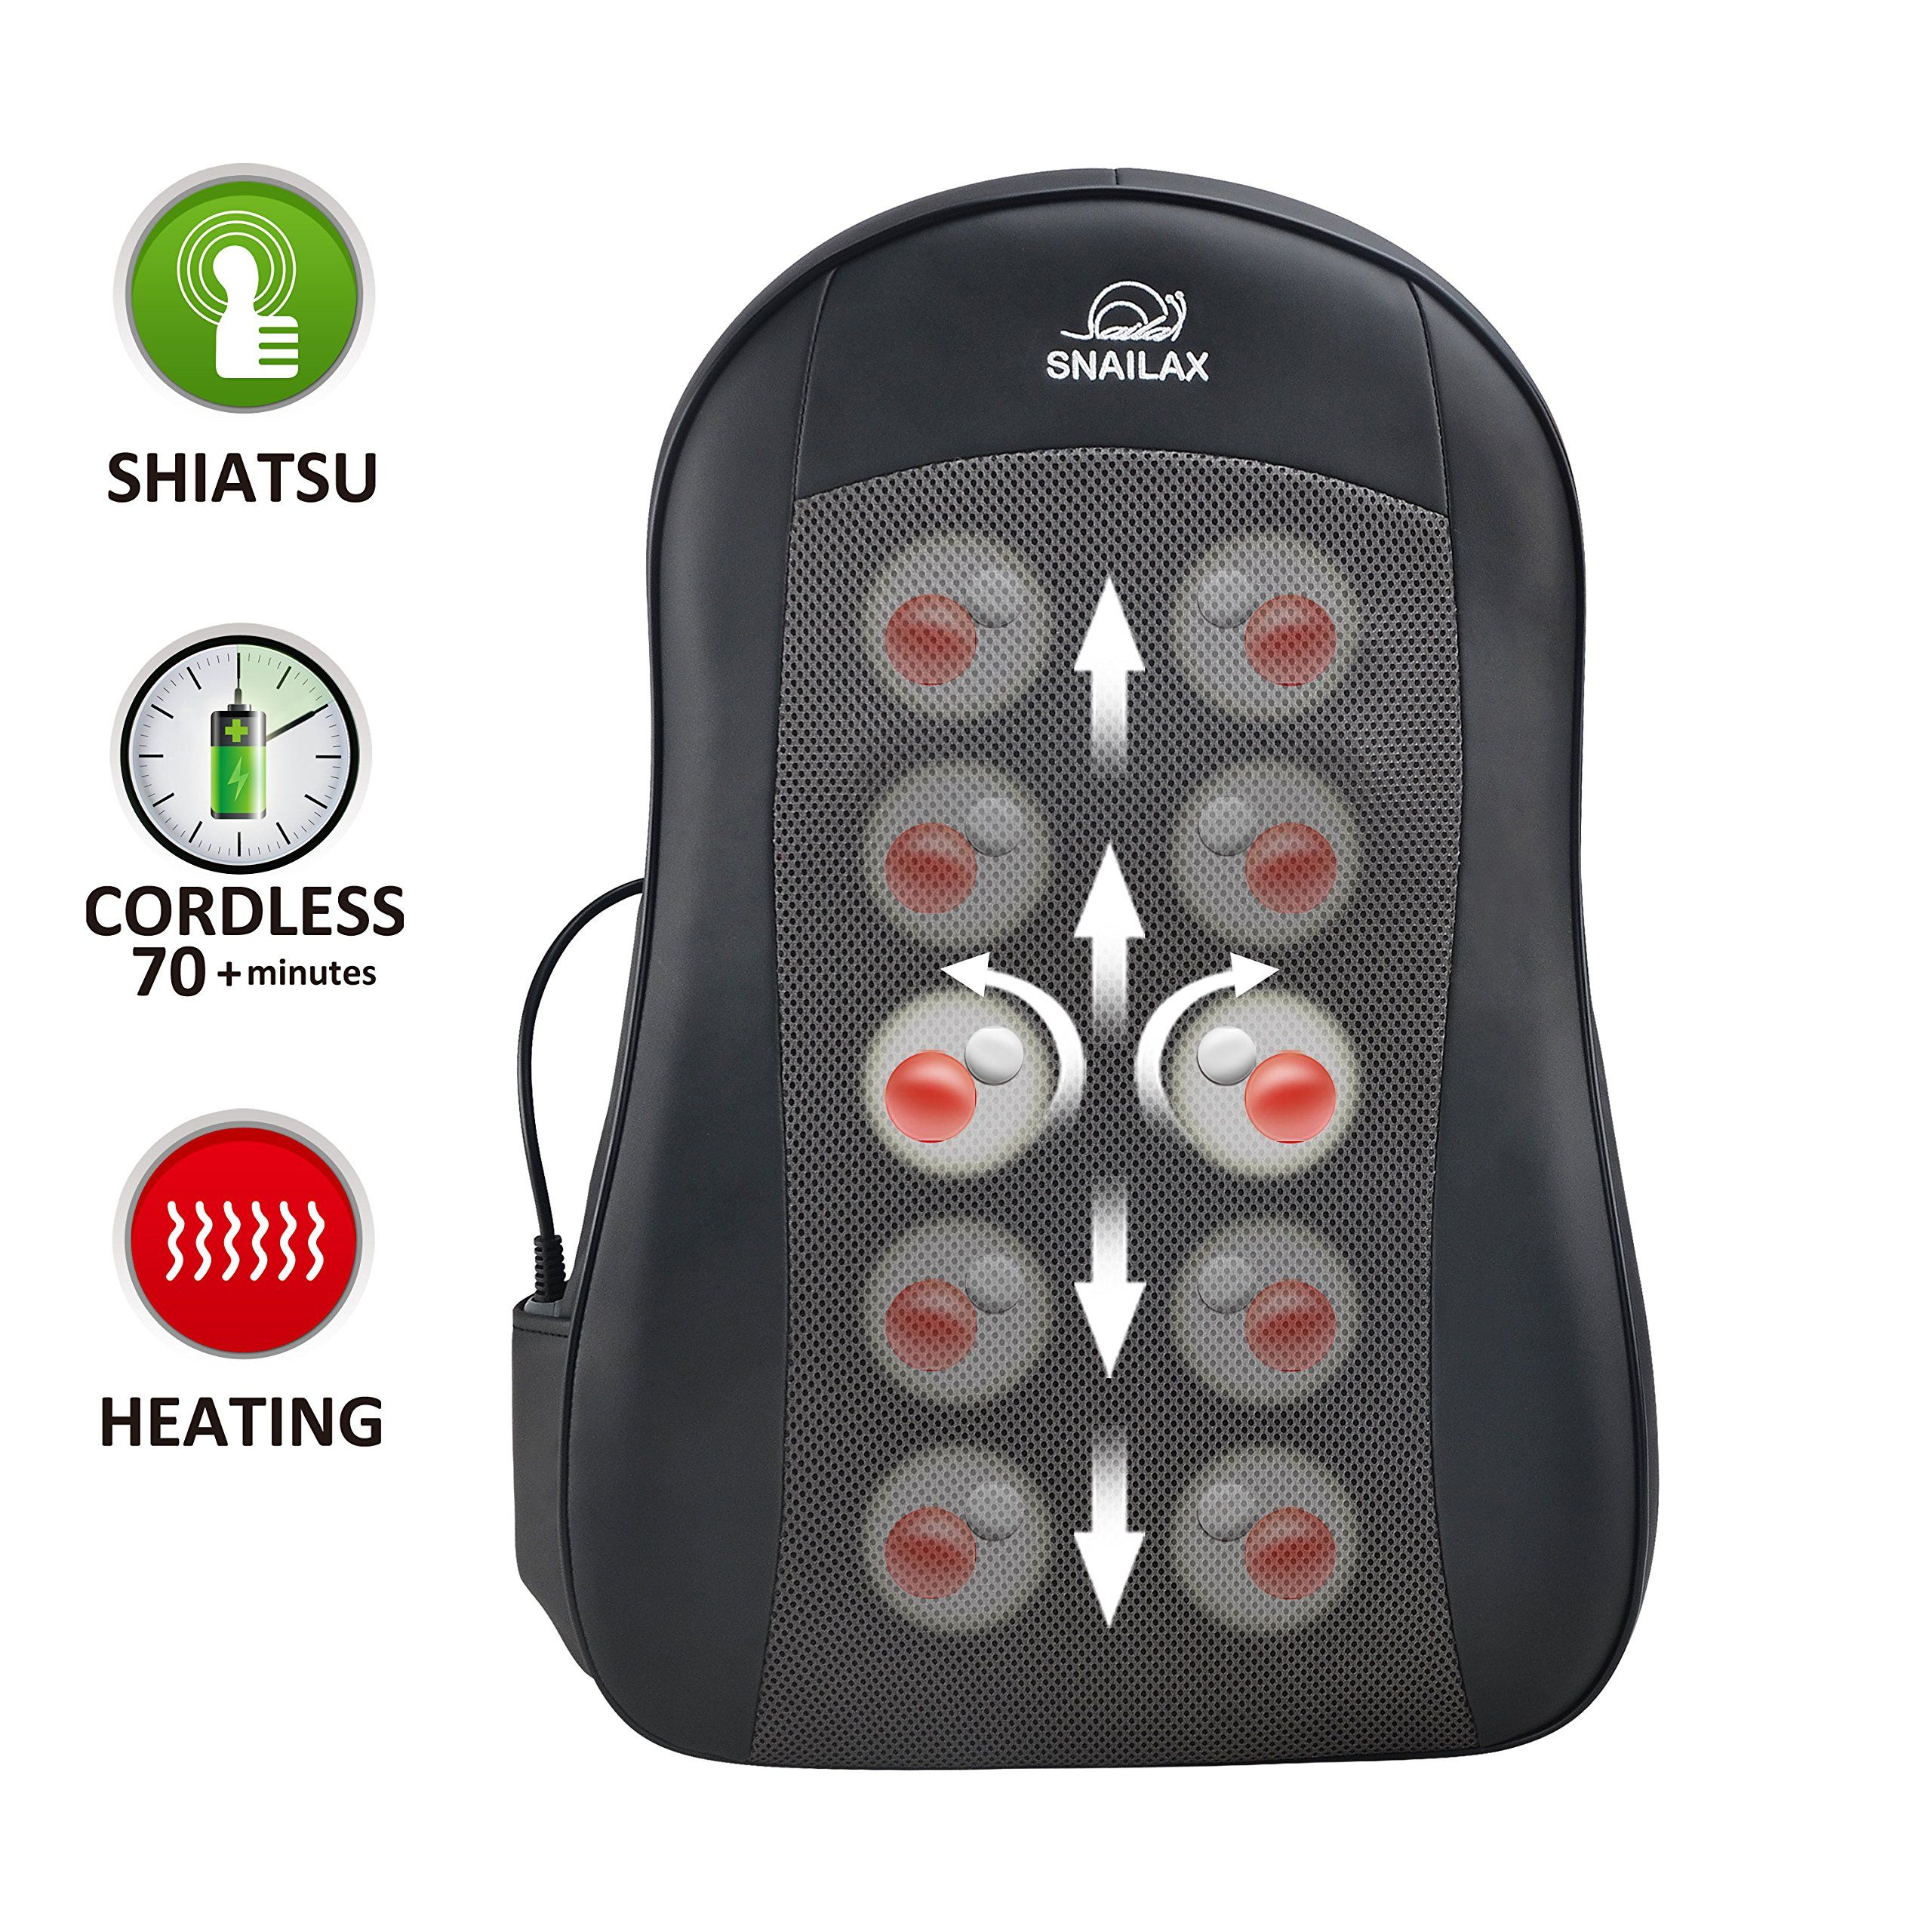 Snailax Cordless Shiatsu Back Massager with Heat Portable